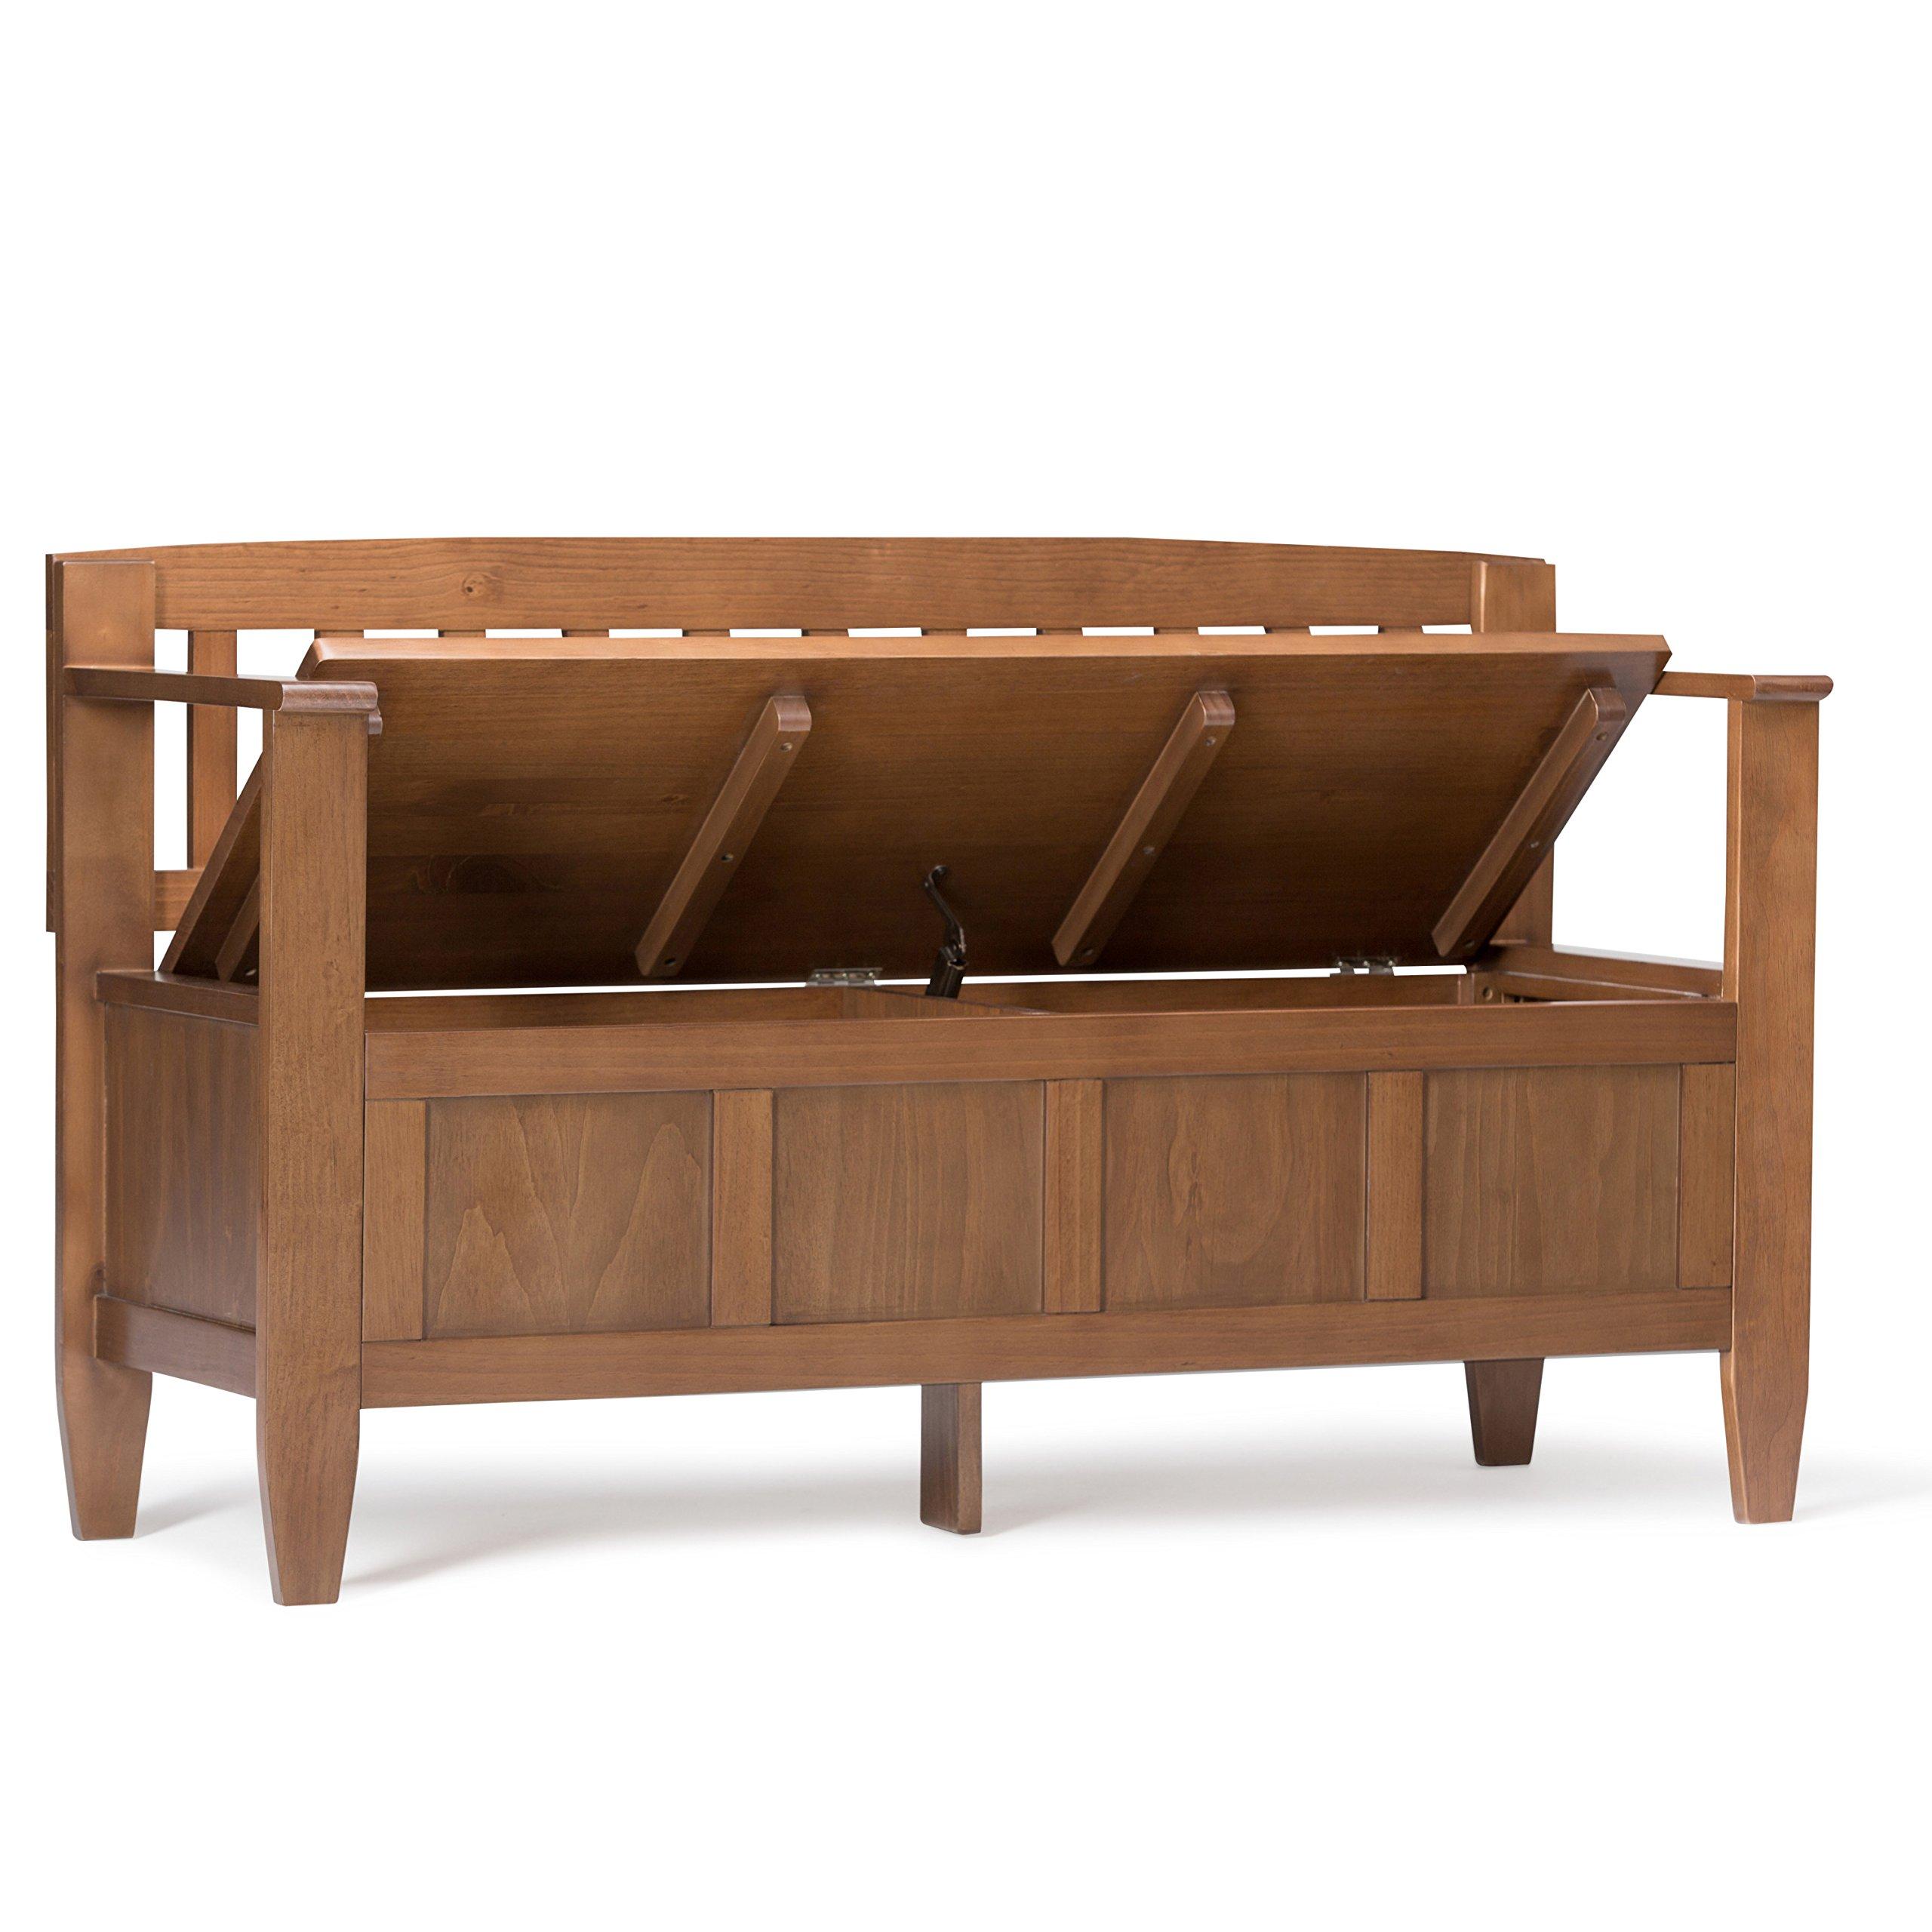 Simpli Home Brooklyn Solid Wood Entryway Storage Bench, Medium Saddle Brown by Simpli Home (Image #3)